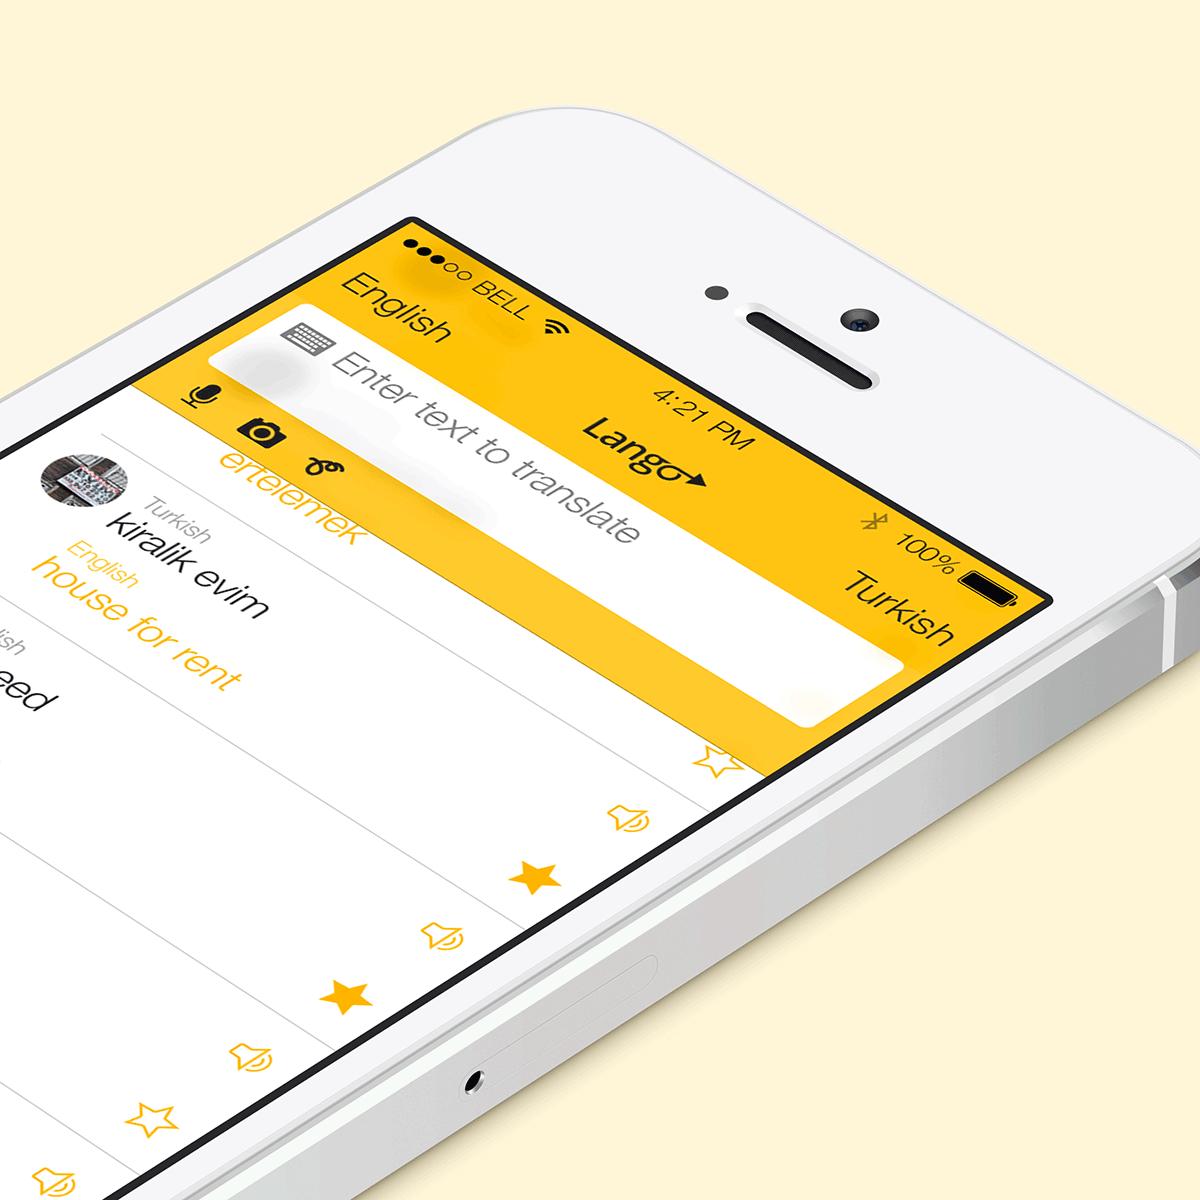 Lango universal translator app top detail